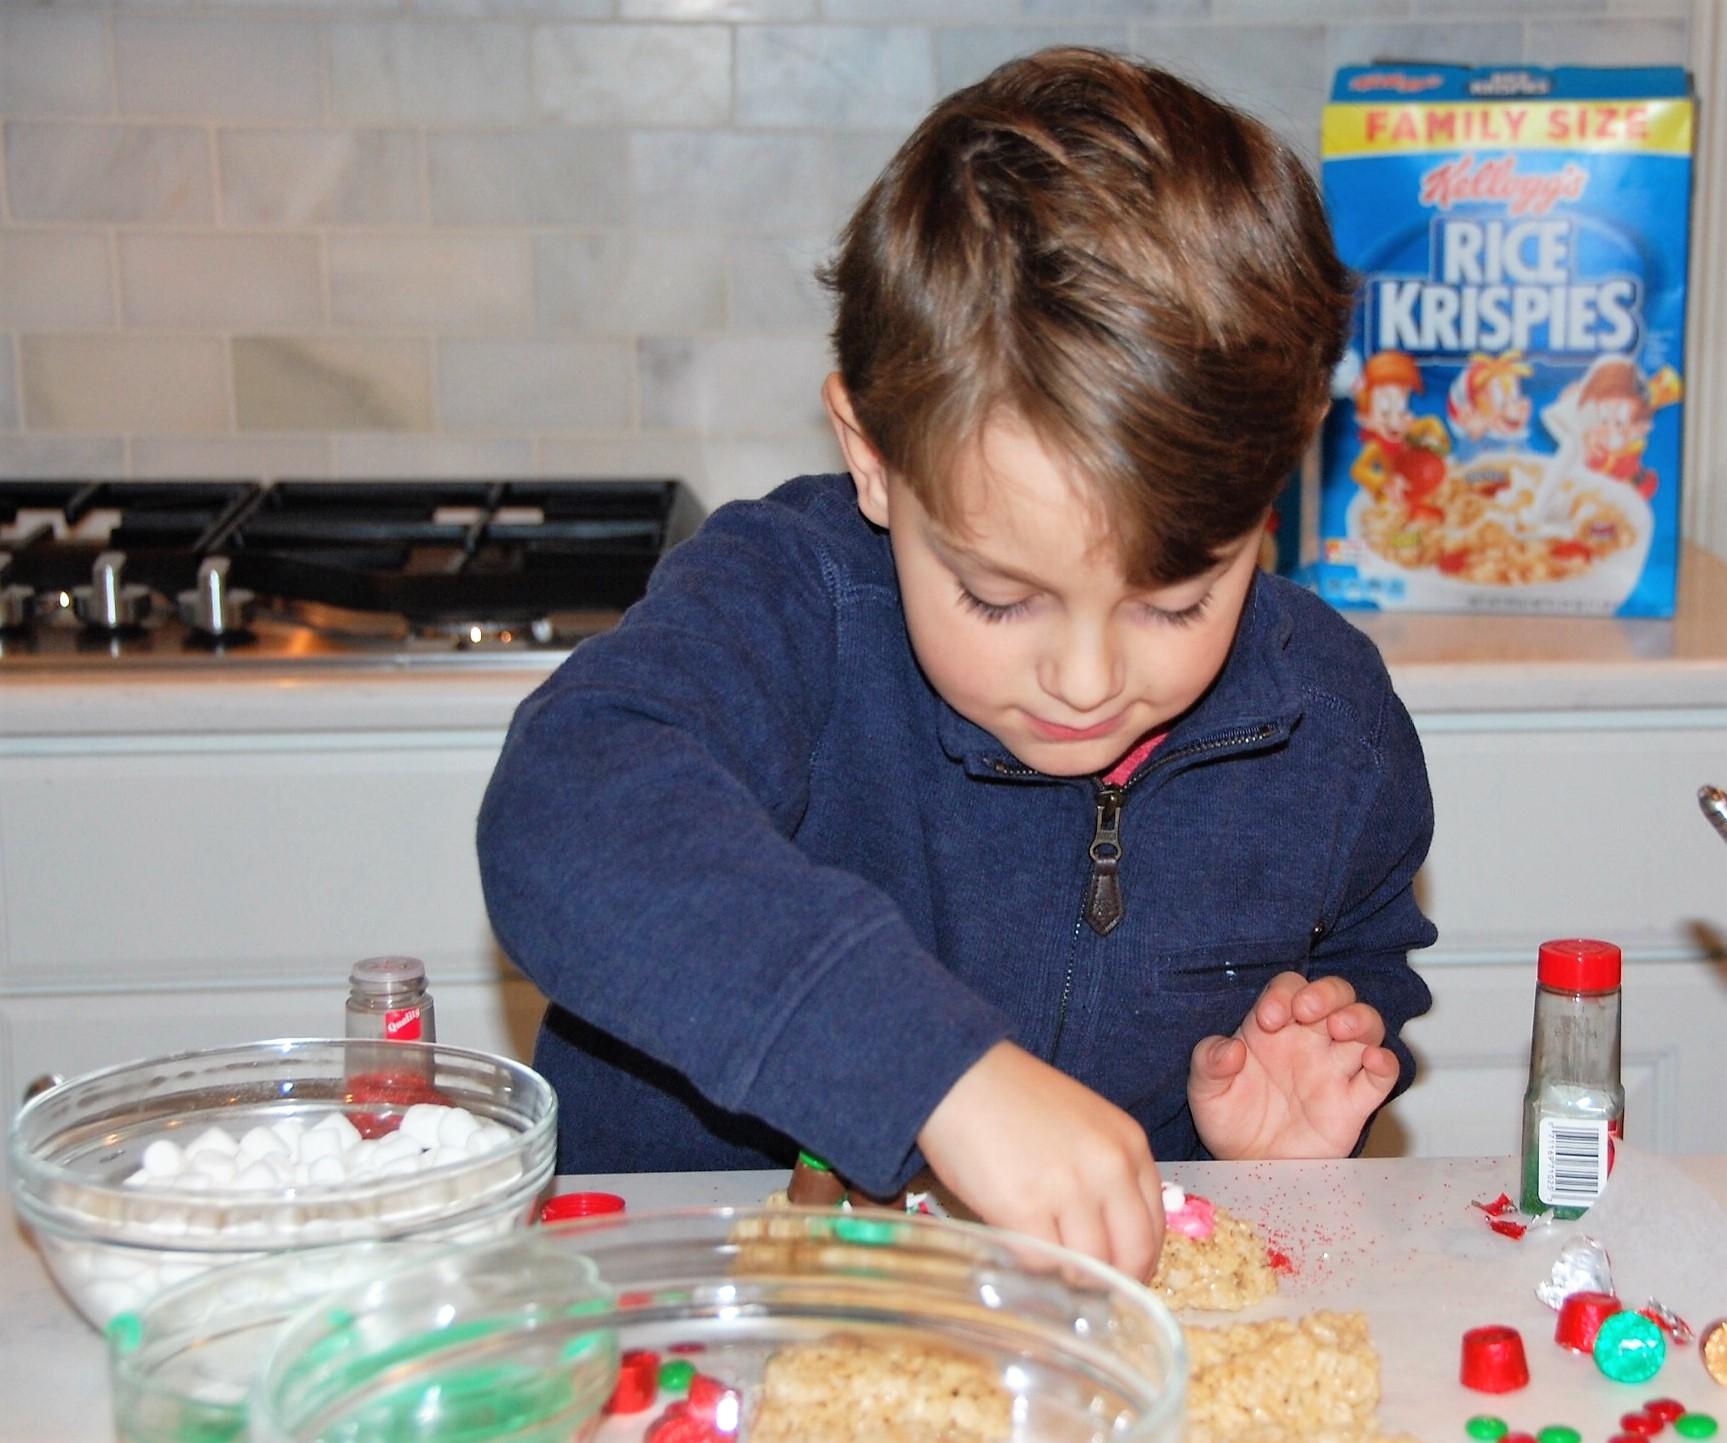 Knox Bishop making Rice Krispies Treats